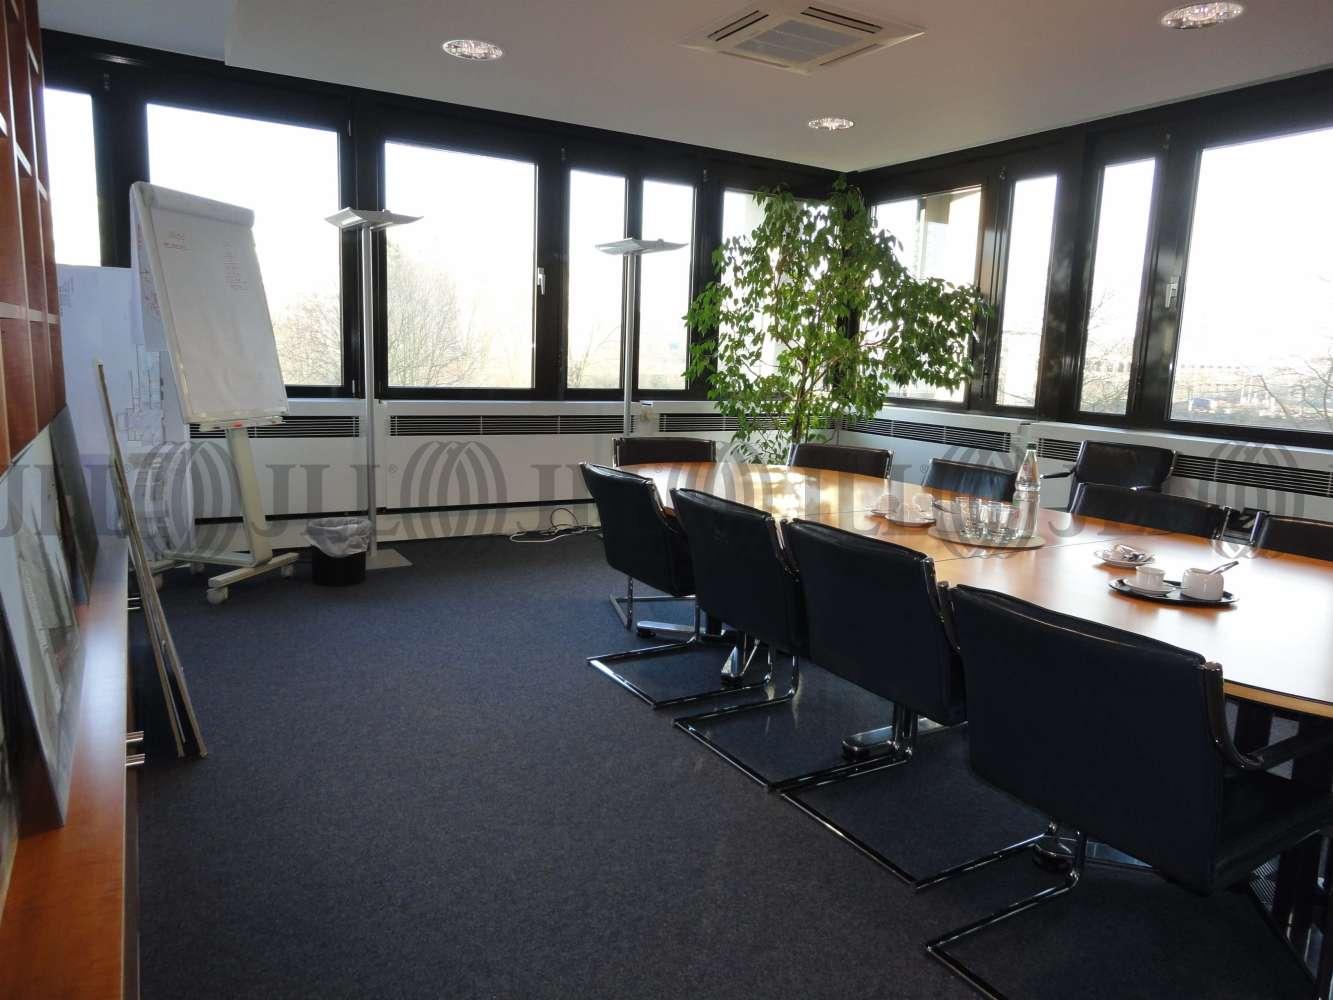 Büros Frankfurt am main, 60528 - Büro - Frankfurt am Main, Schwanheim - F1593 - 10043857